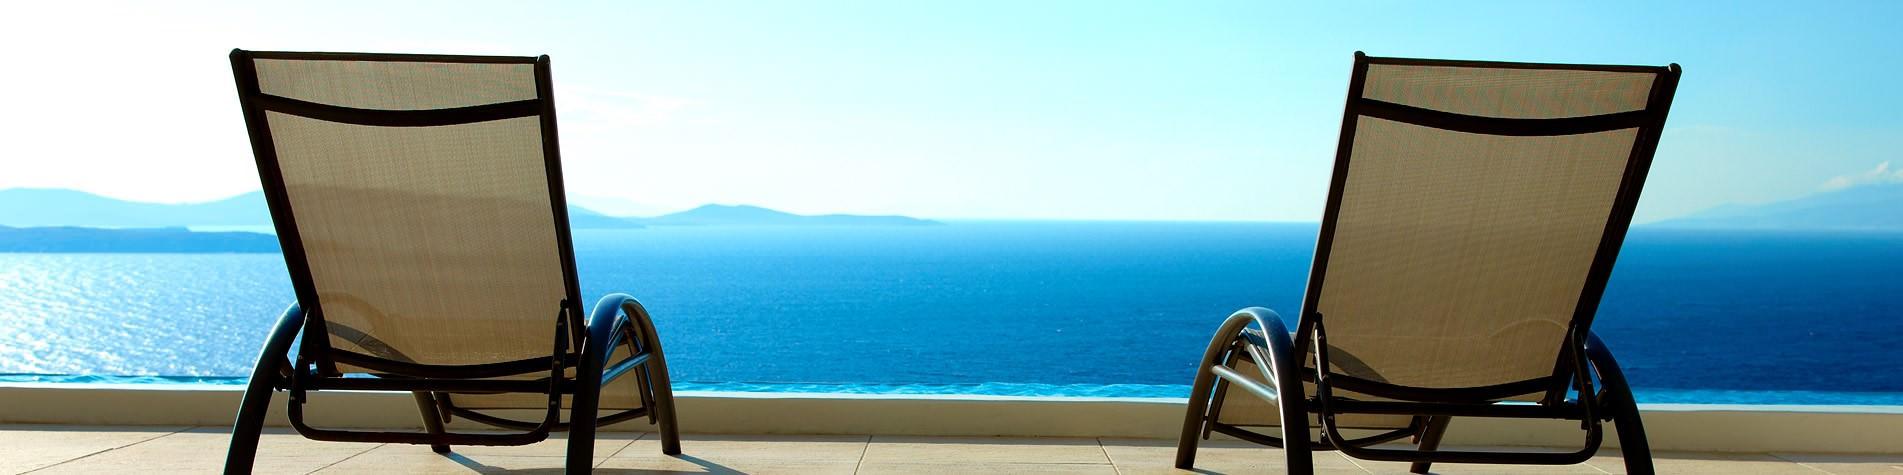 Mykonos Island Holidays